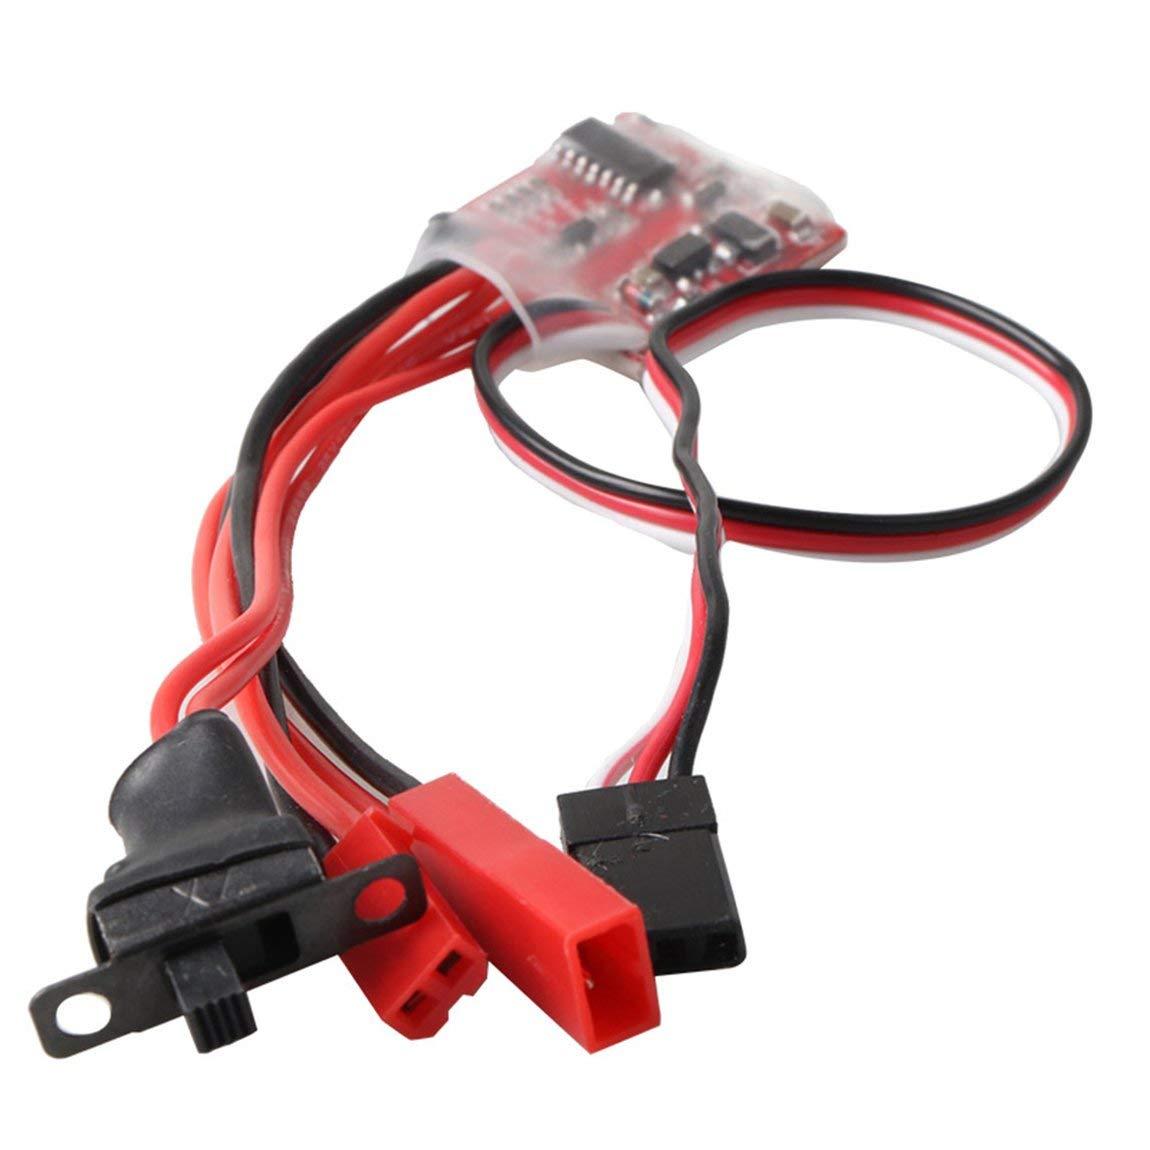 73JohnPol Synthetic 30A Mini Brushed ESC Brush Controlador electr/ónico de Velocidad del Cepillo de Freno bidireccional para Coche RC Color: Rojo